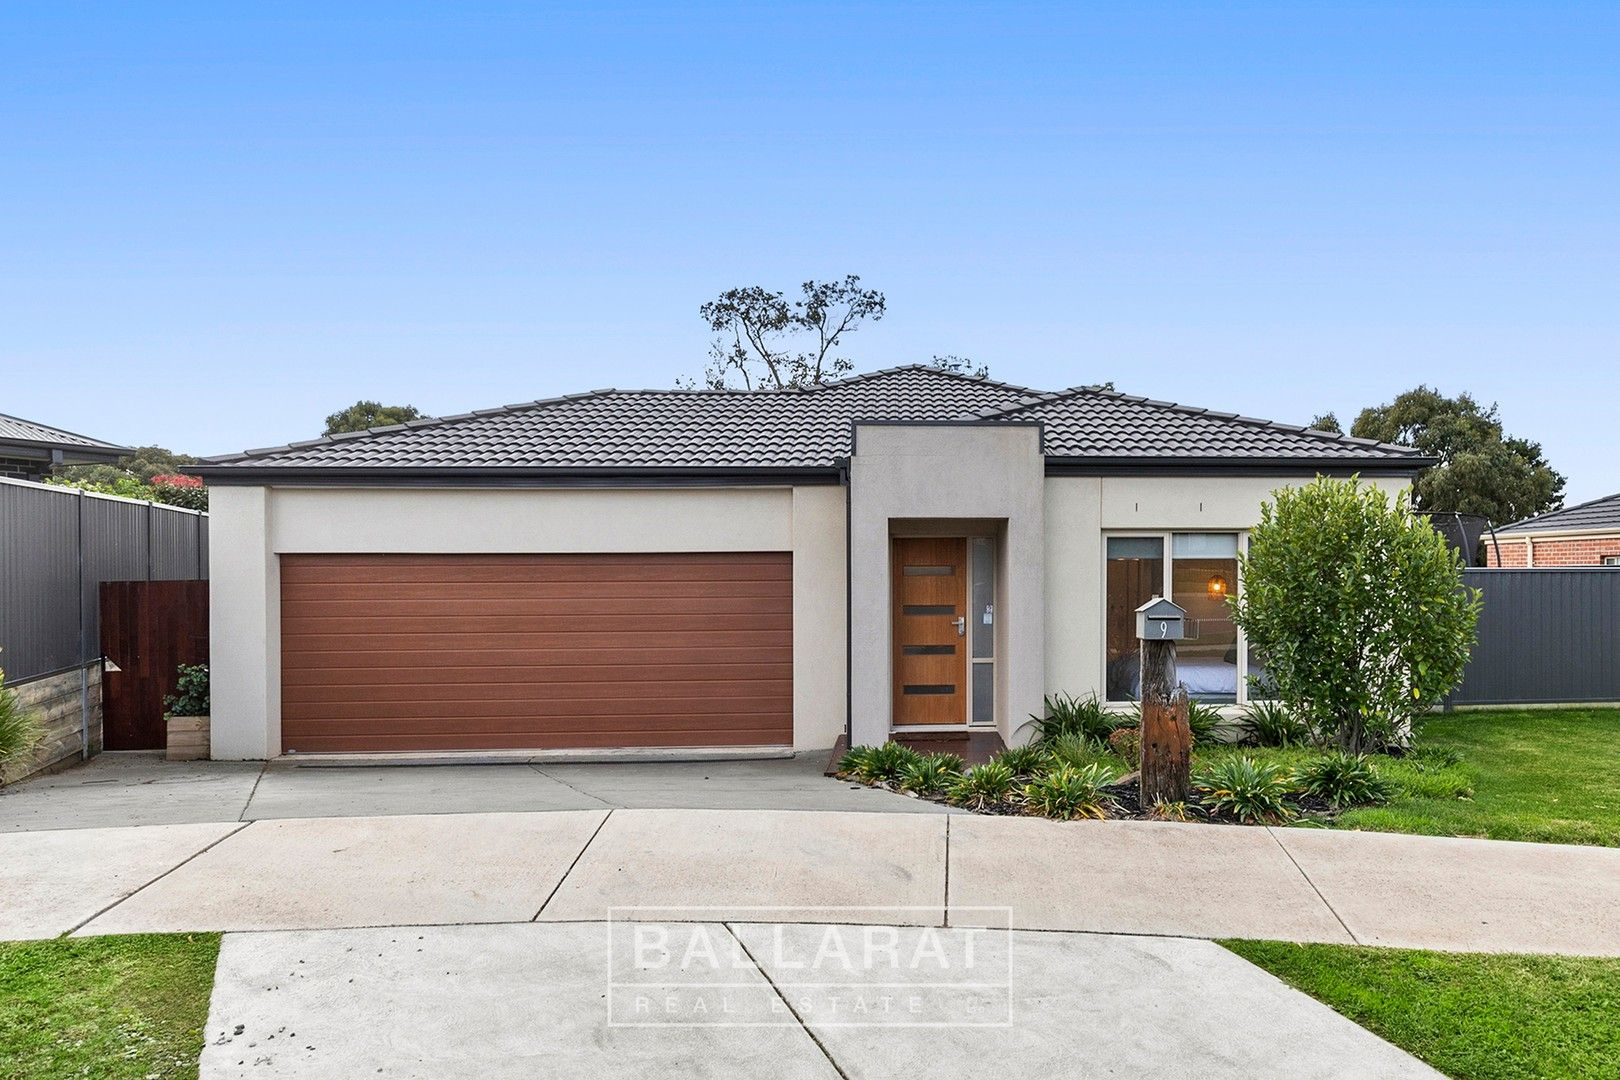 9 Nelmore Court, Ballarat East VIC 3350, Image 0